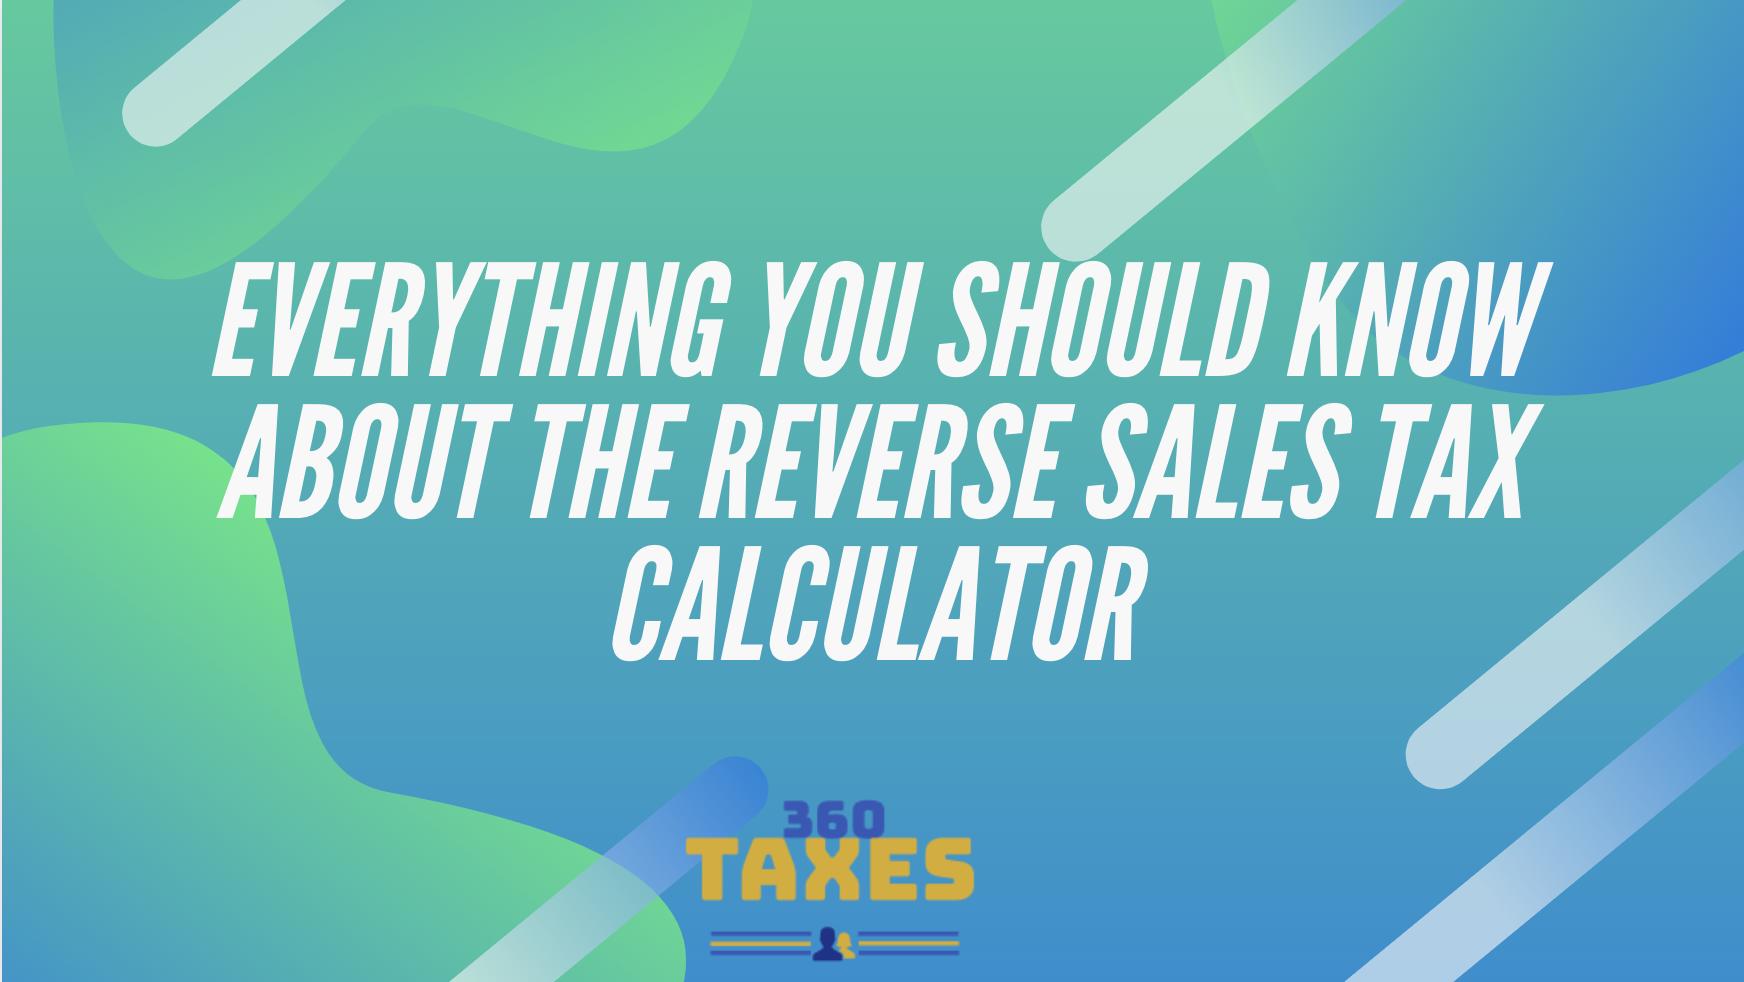 Reverse Sales Tax Calculator